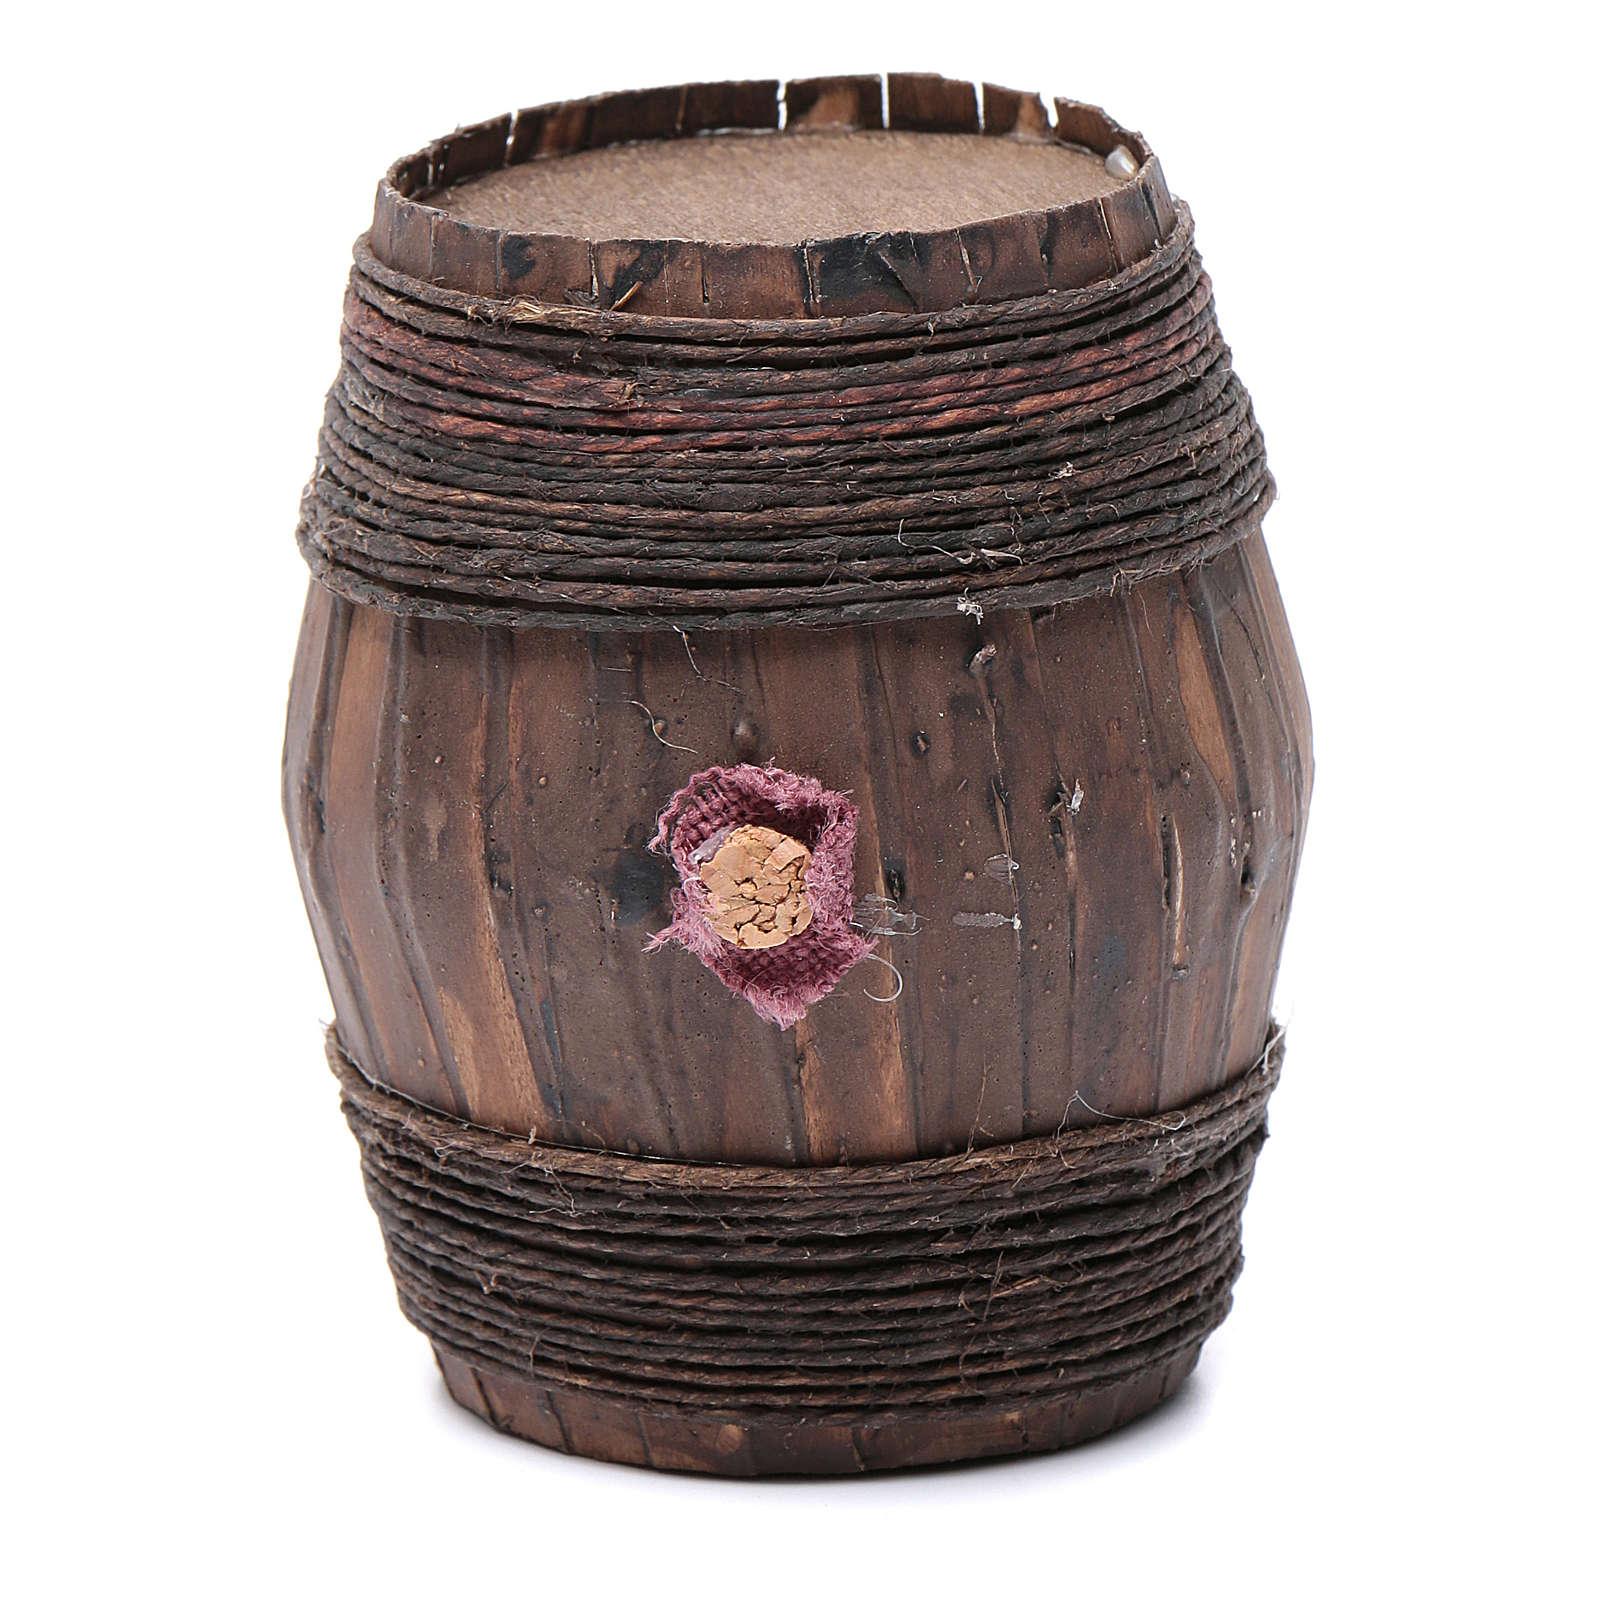 Botte in legno 10X6,5 cm per presepe napoletano 4